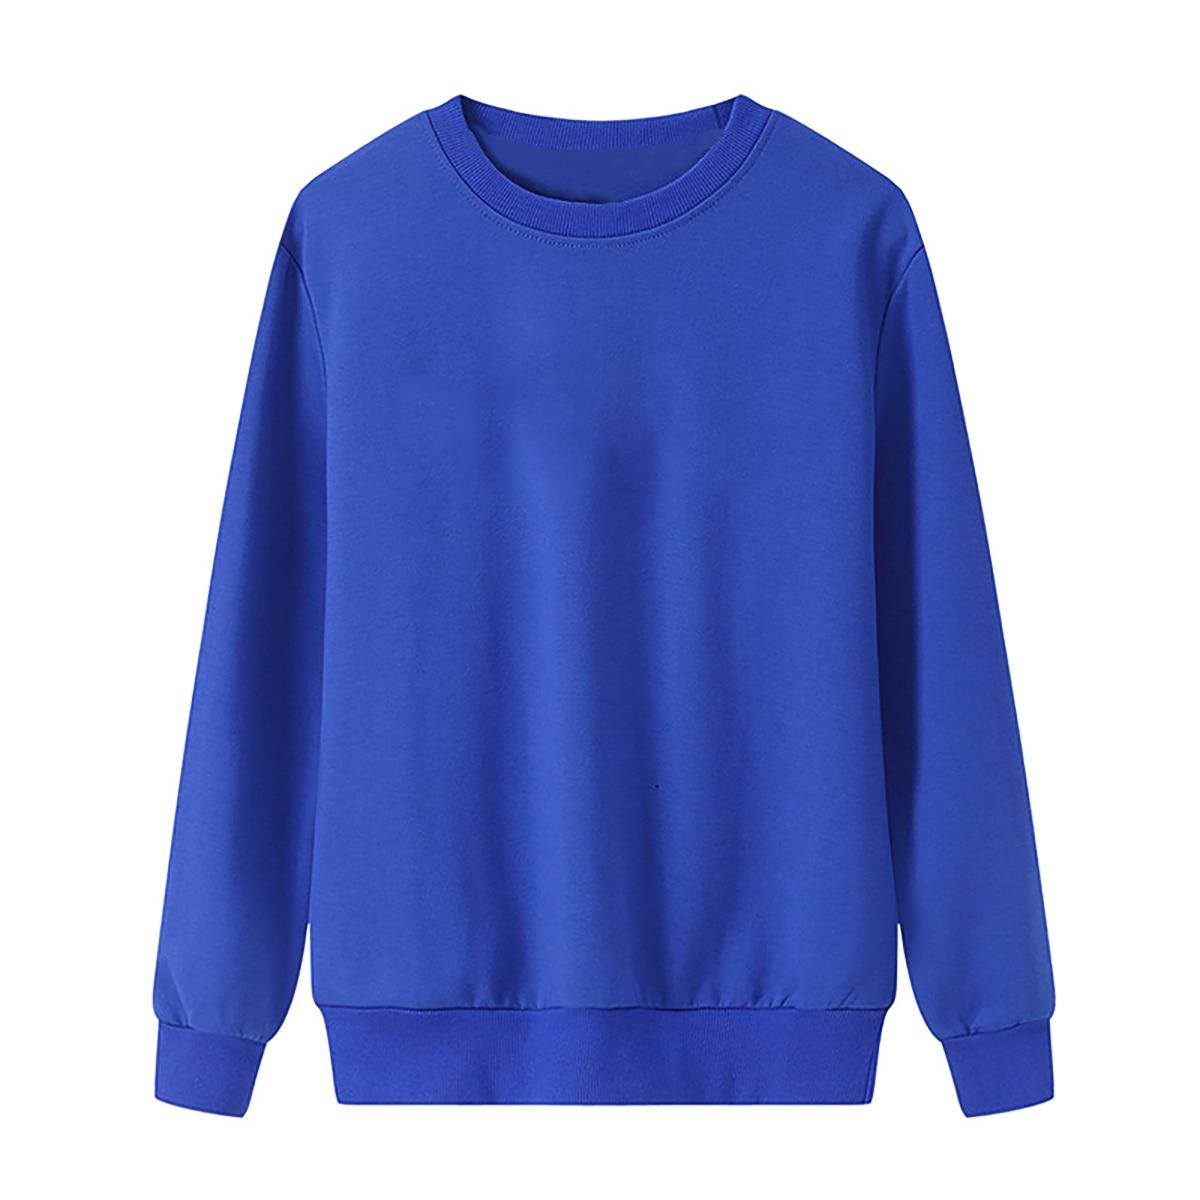 Solid Color Sweatshirt Women Casual Hoodie Fashion Winter Autumn Lasdies Pullover Fleece Black White Blue Red Gray Streetwear